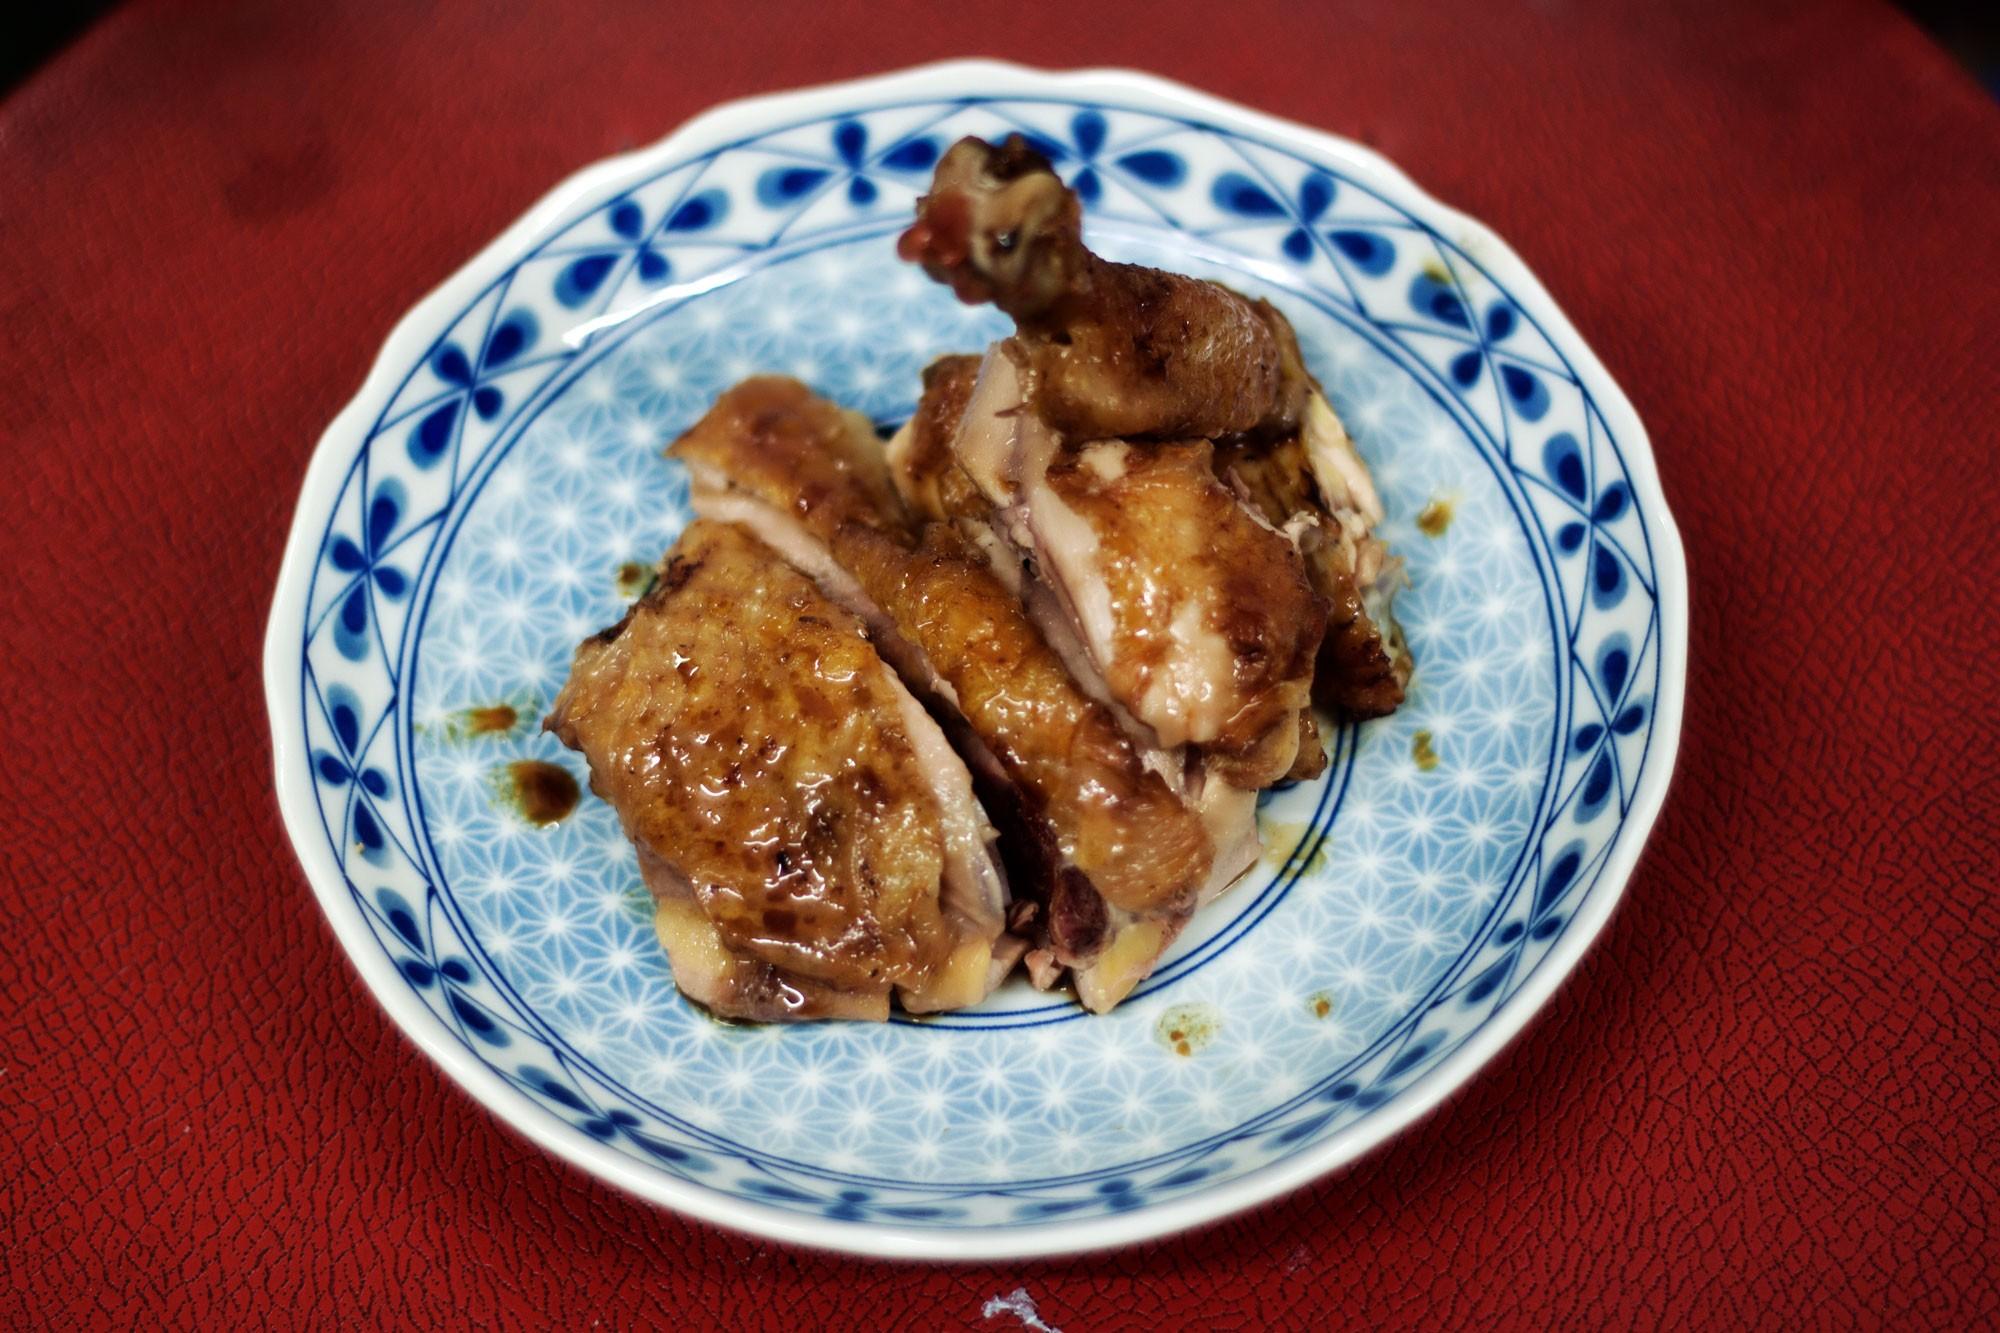 CNYcrispy-fried-chicken-final-4